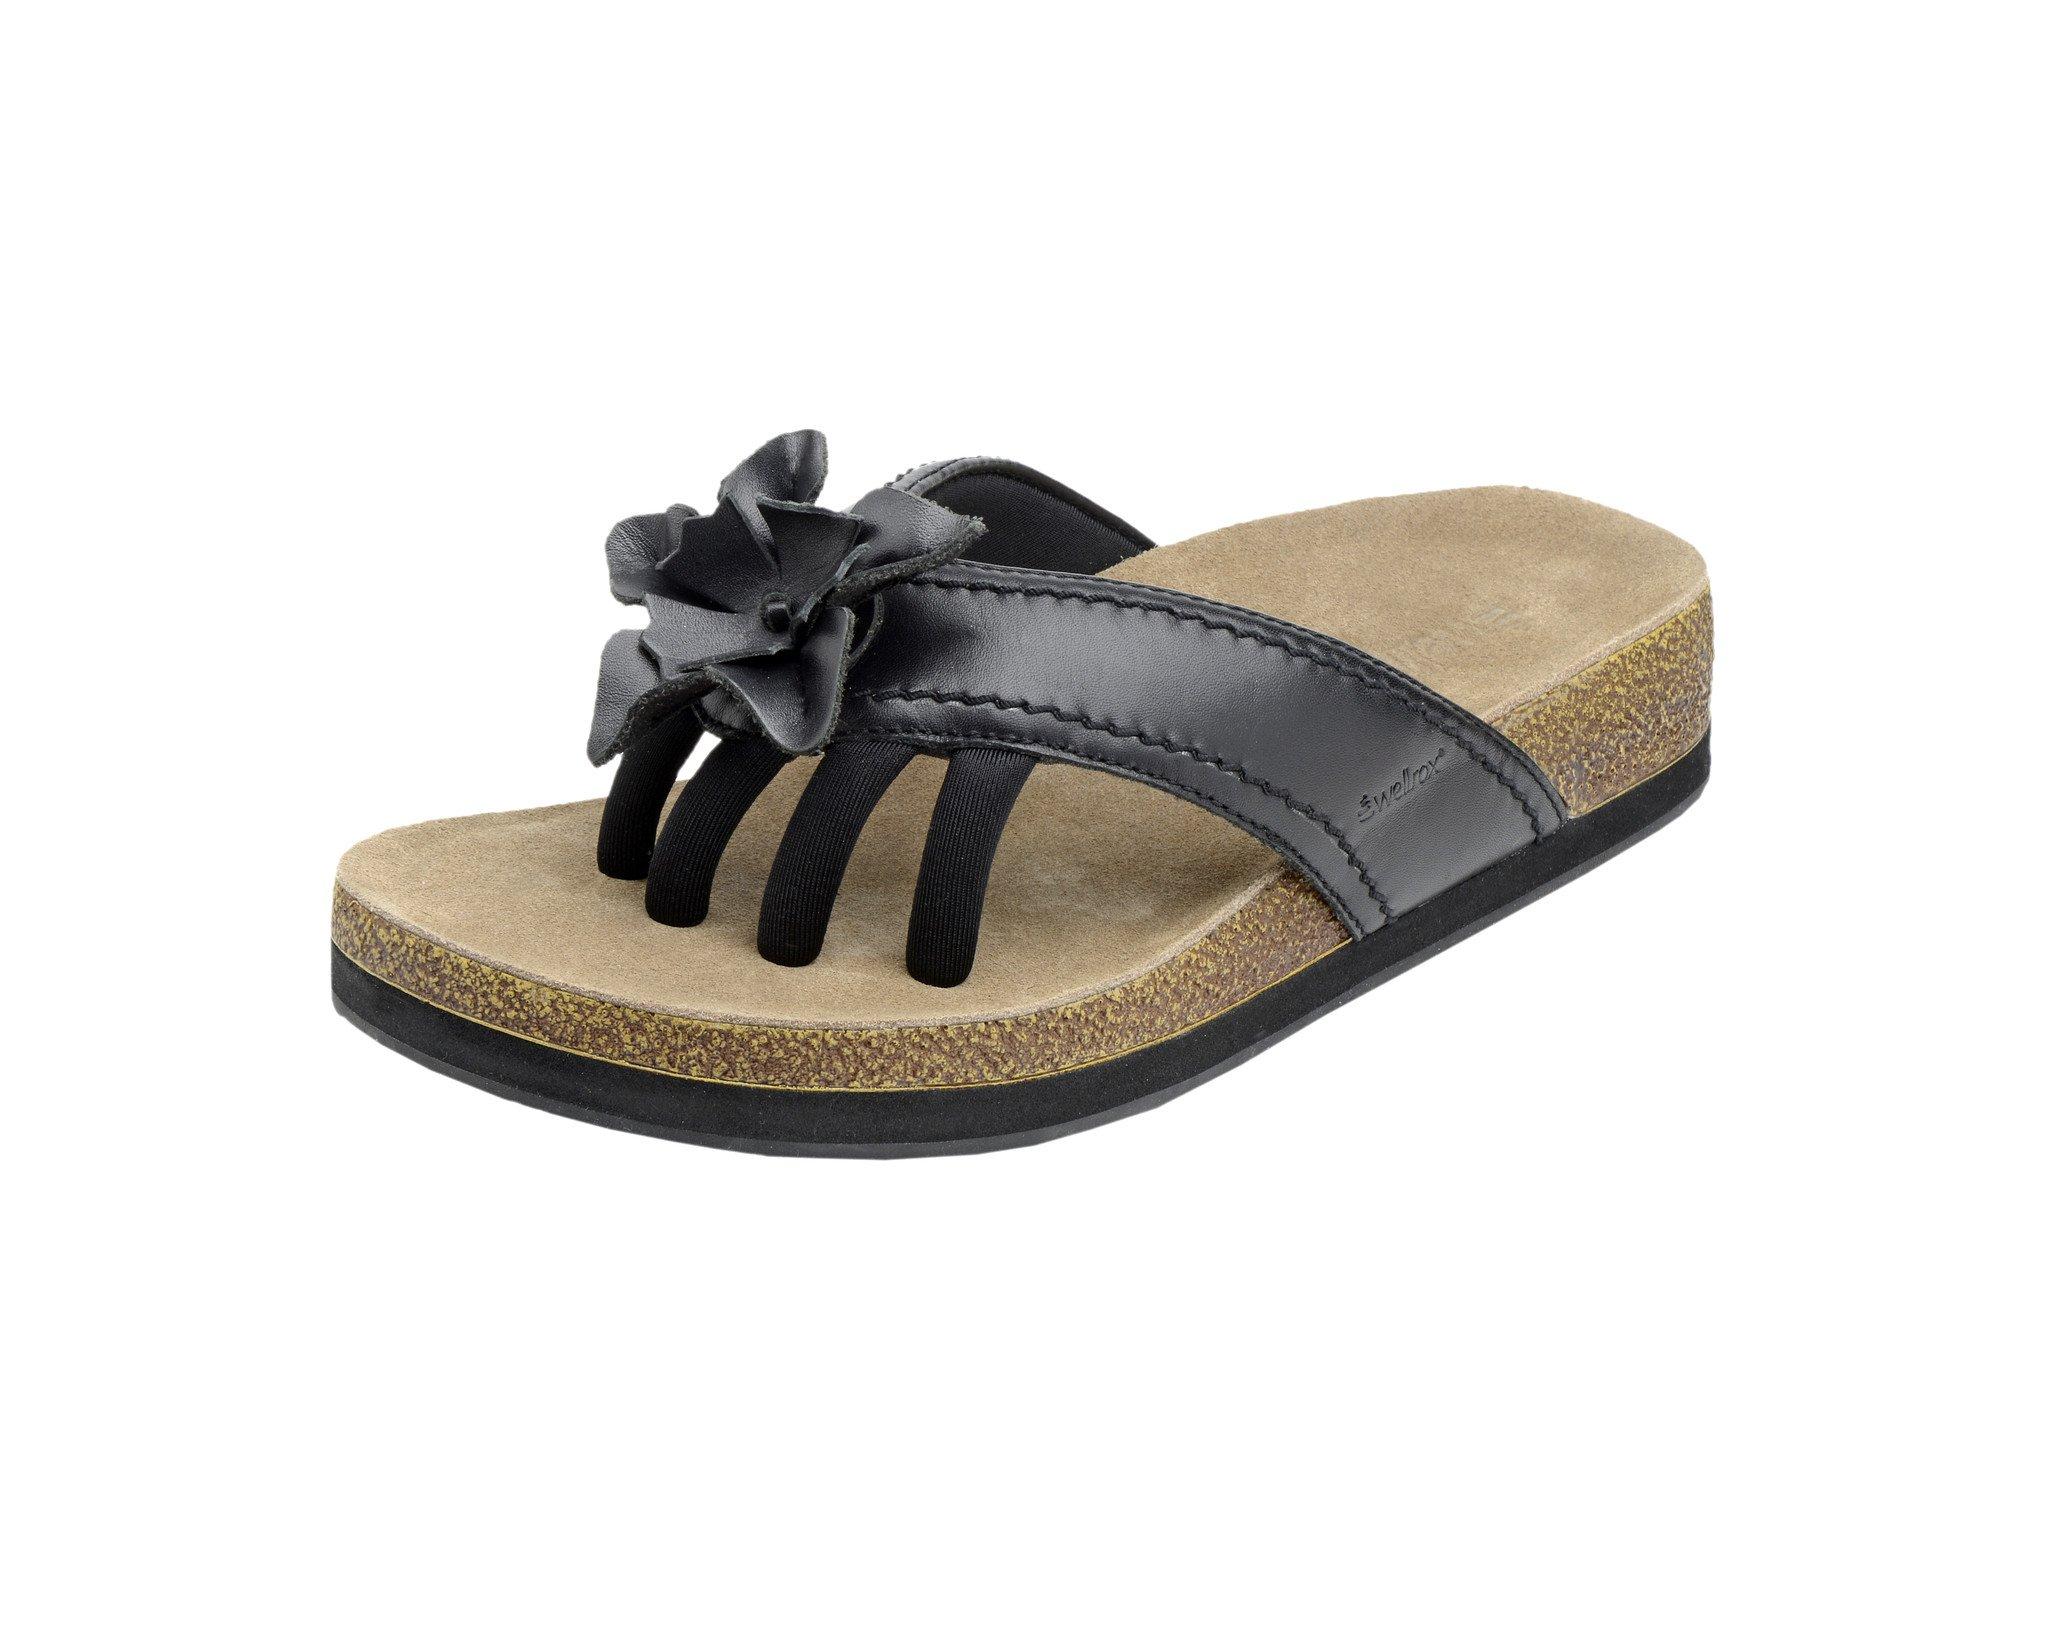 fbcaffc27568 WELLROX Women s Black Terra Chloe Toe-Separator Wellness Sandals Sz 10 NEW